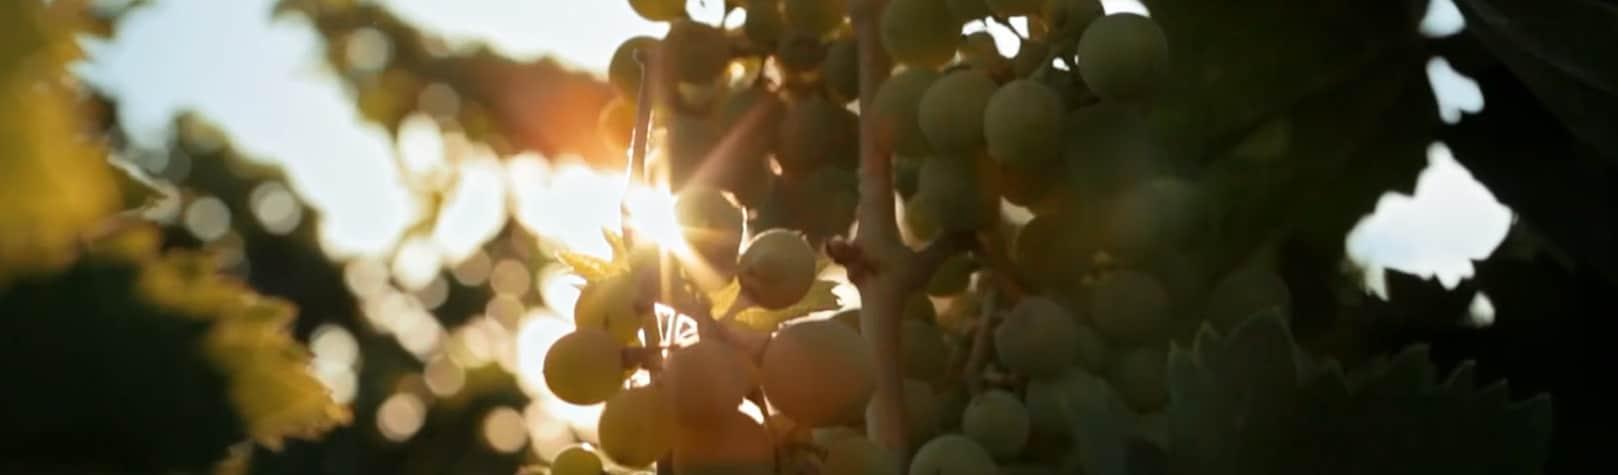 Farnese Vini: Gran Sasso